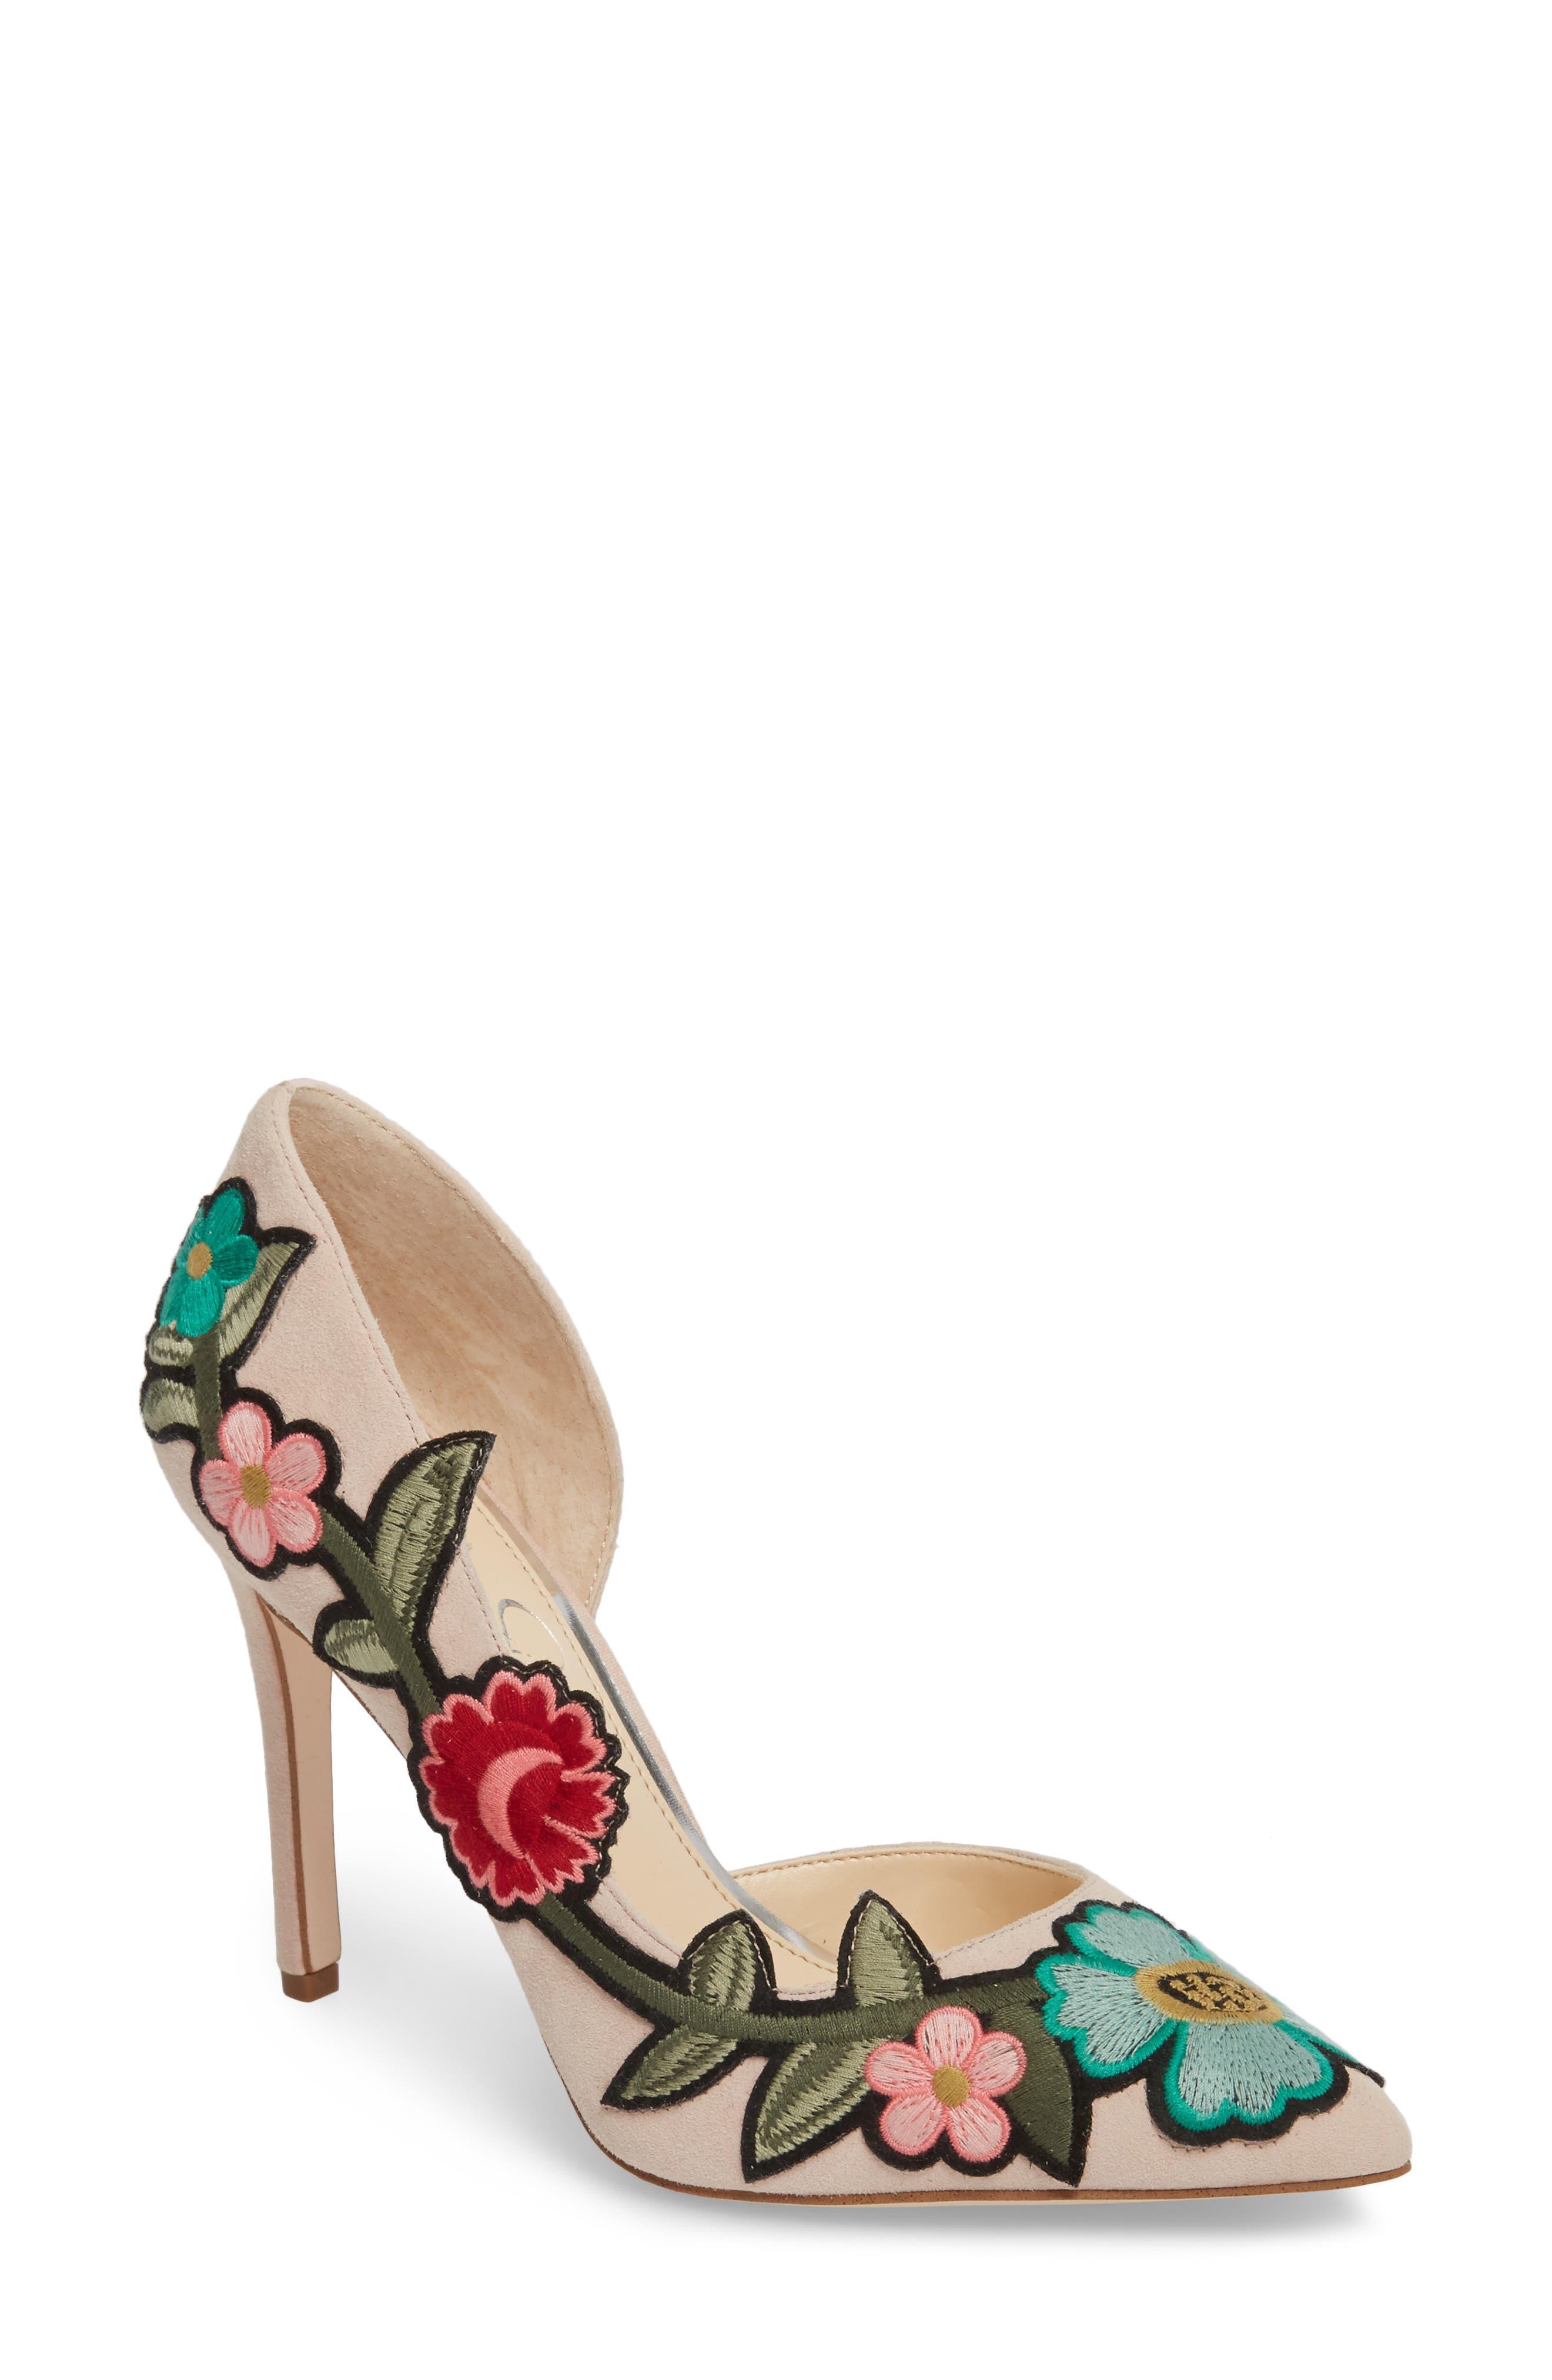 Jessica Simpson Pristina Floral Appliqué Pump (Women)